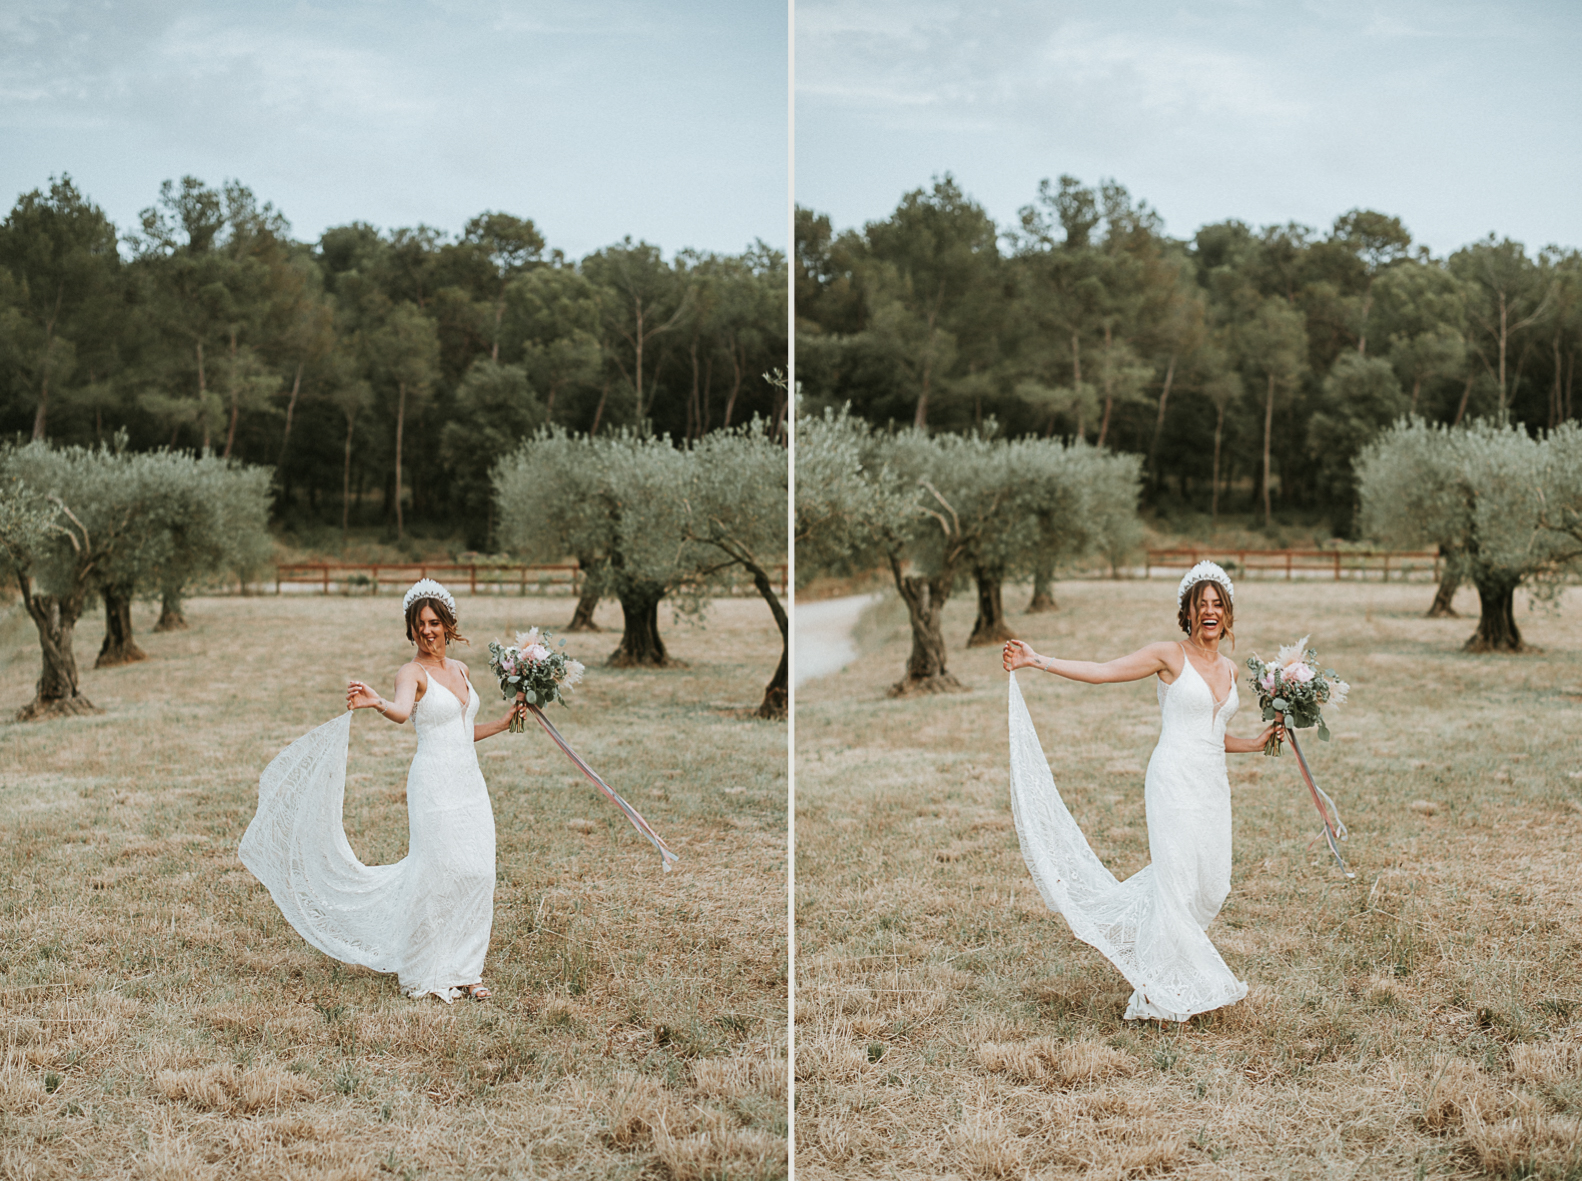 miks-sels-mas-terrats-girona-wedding-photographer-83.1